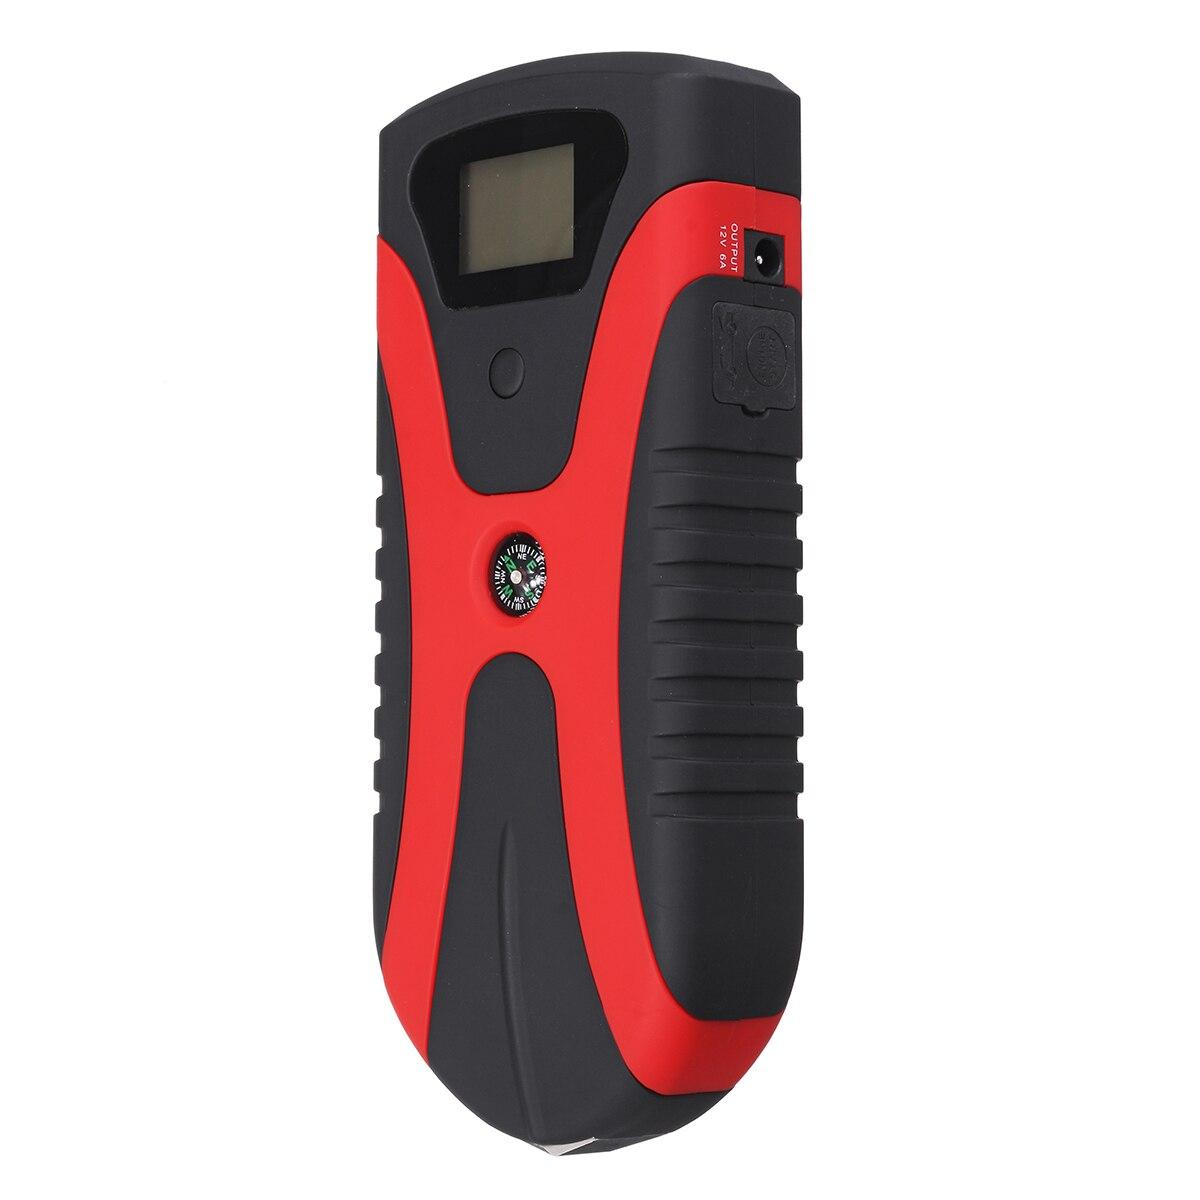 180A Tragbare Multi Funktion Power Auto Starthilfe Notfall Licht Tragbare Auto Batterie Booster Ladegerät Mit USB schnelle lade - 5